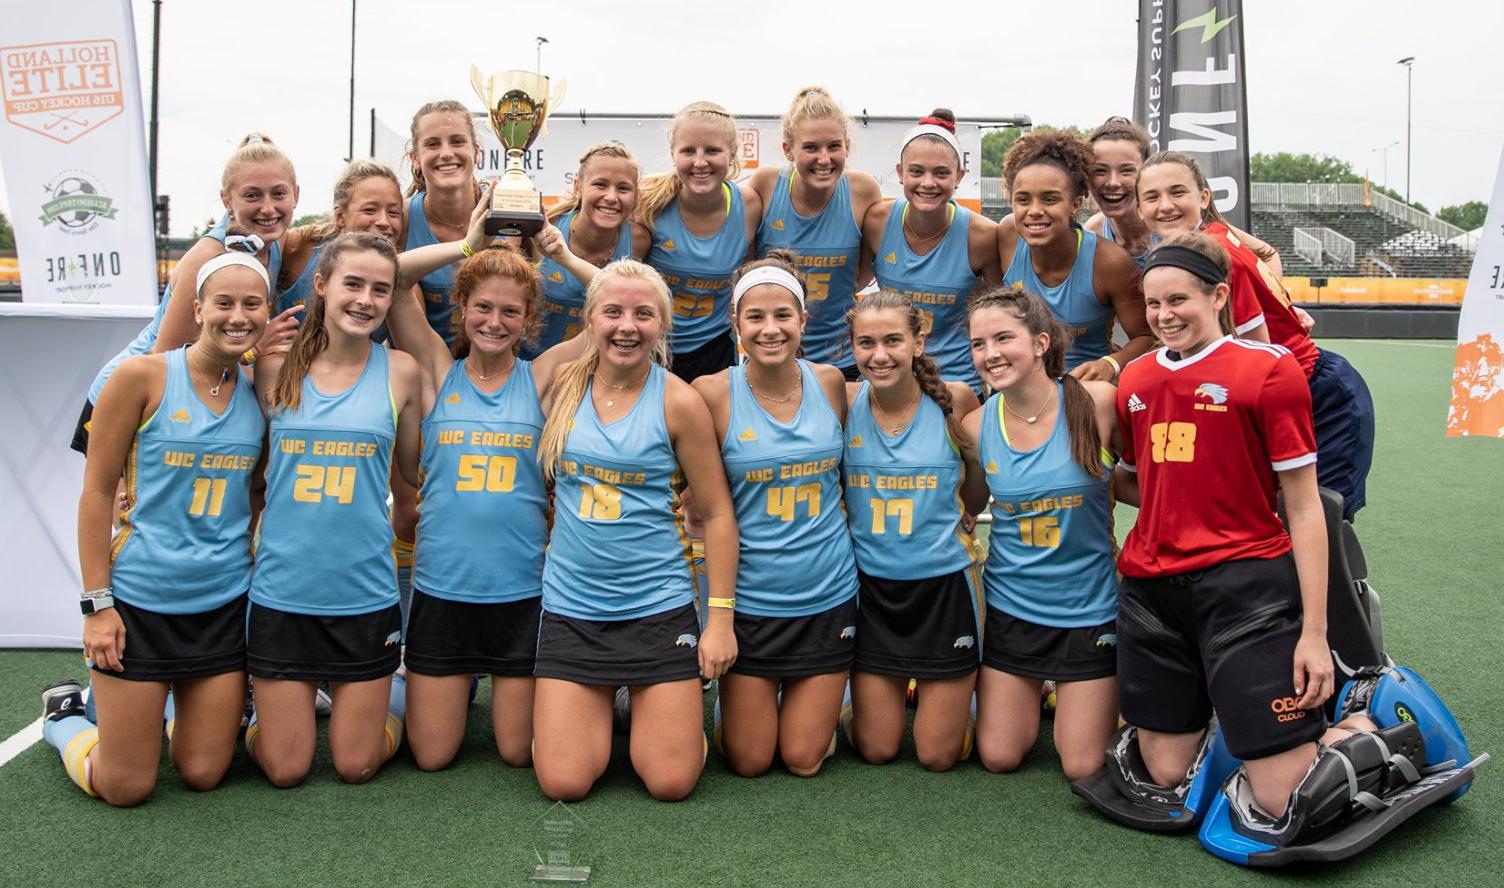 WC Eagles Win Holland U16 Elite Cup